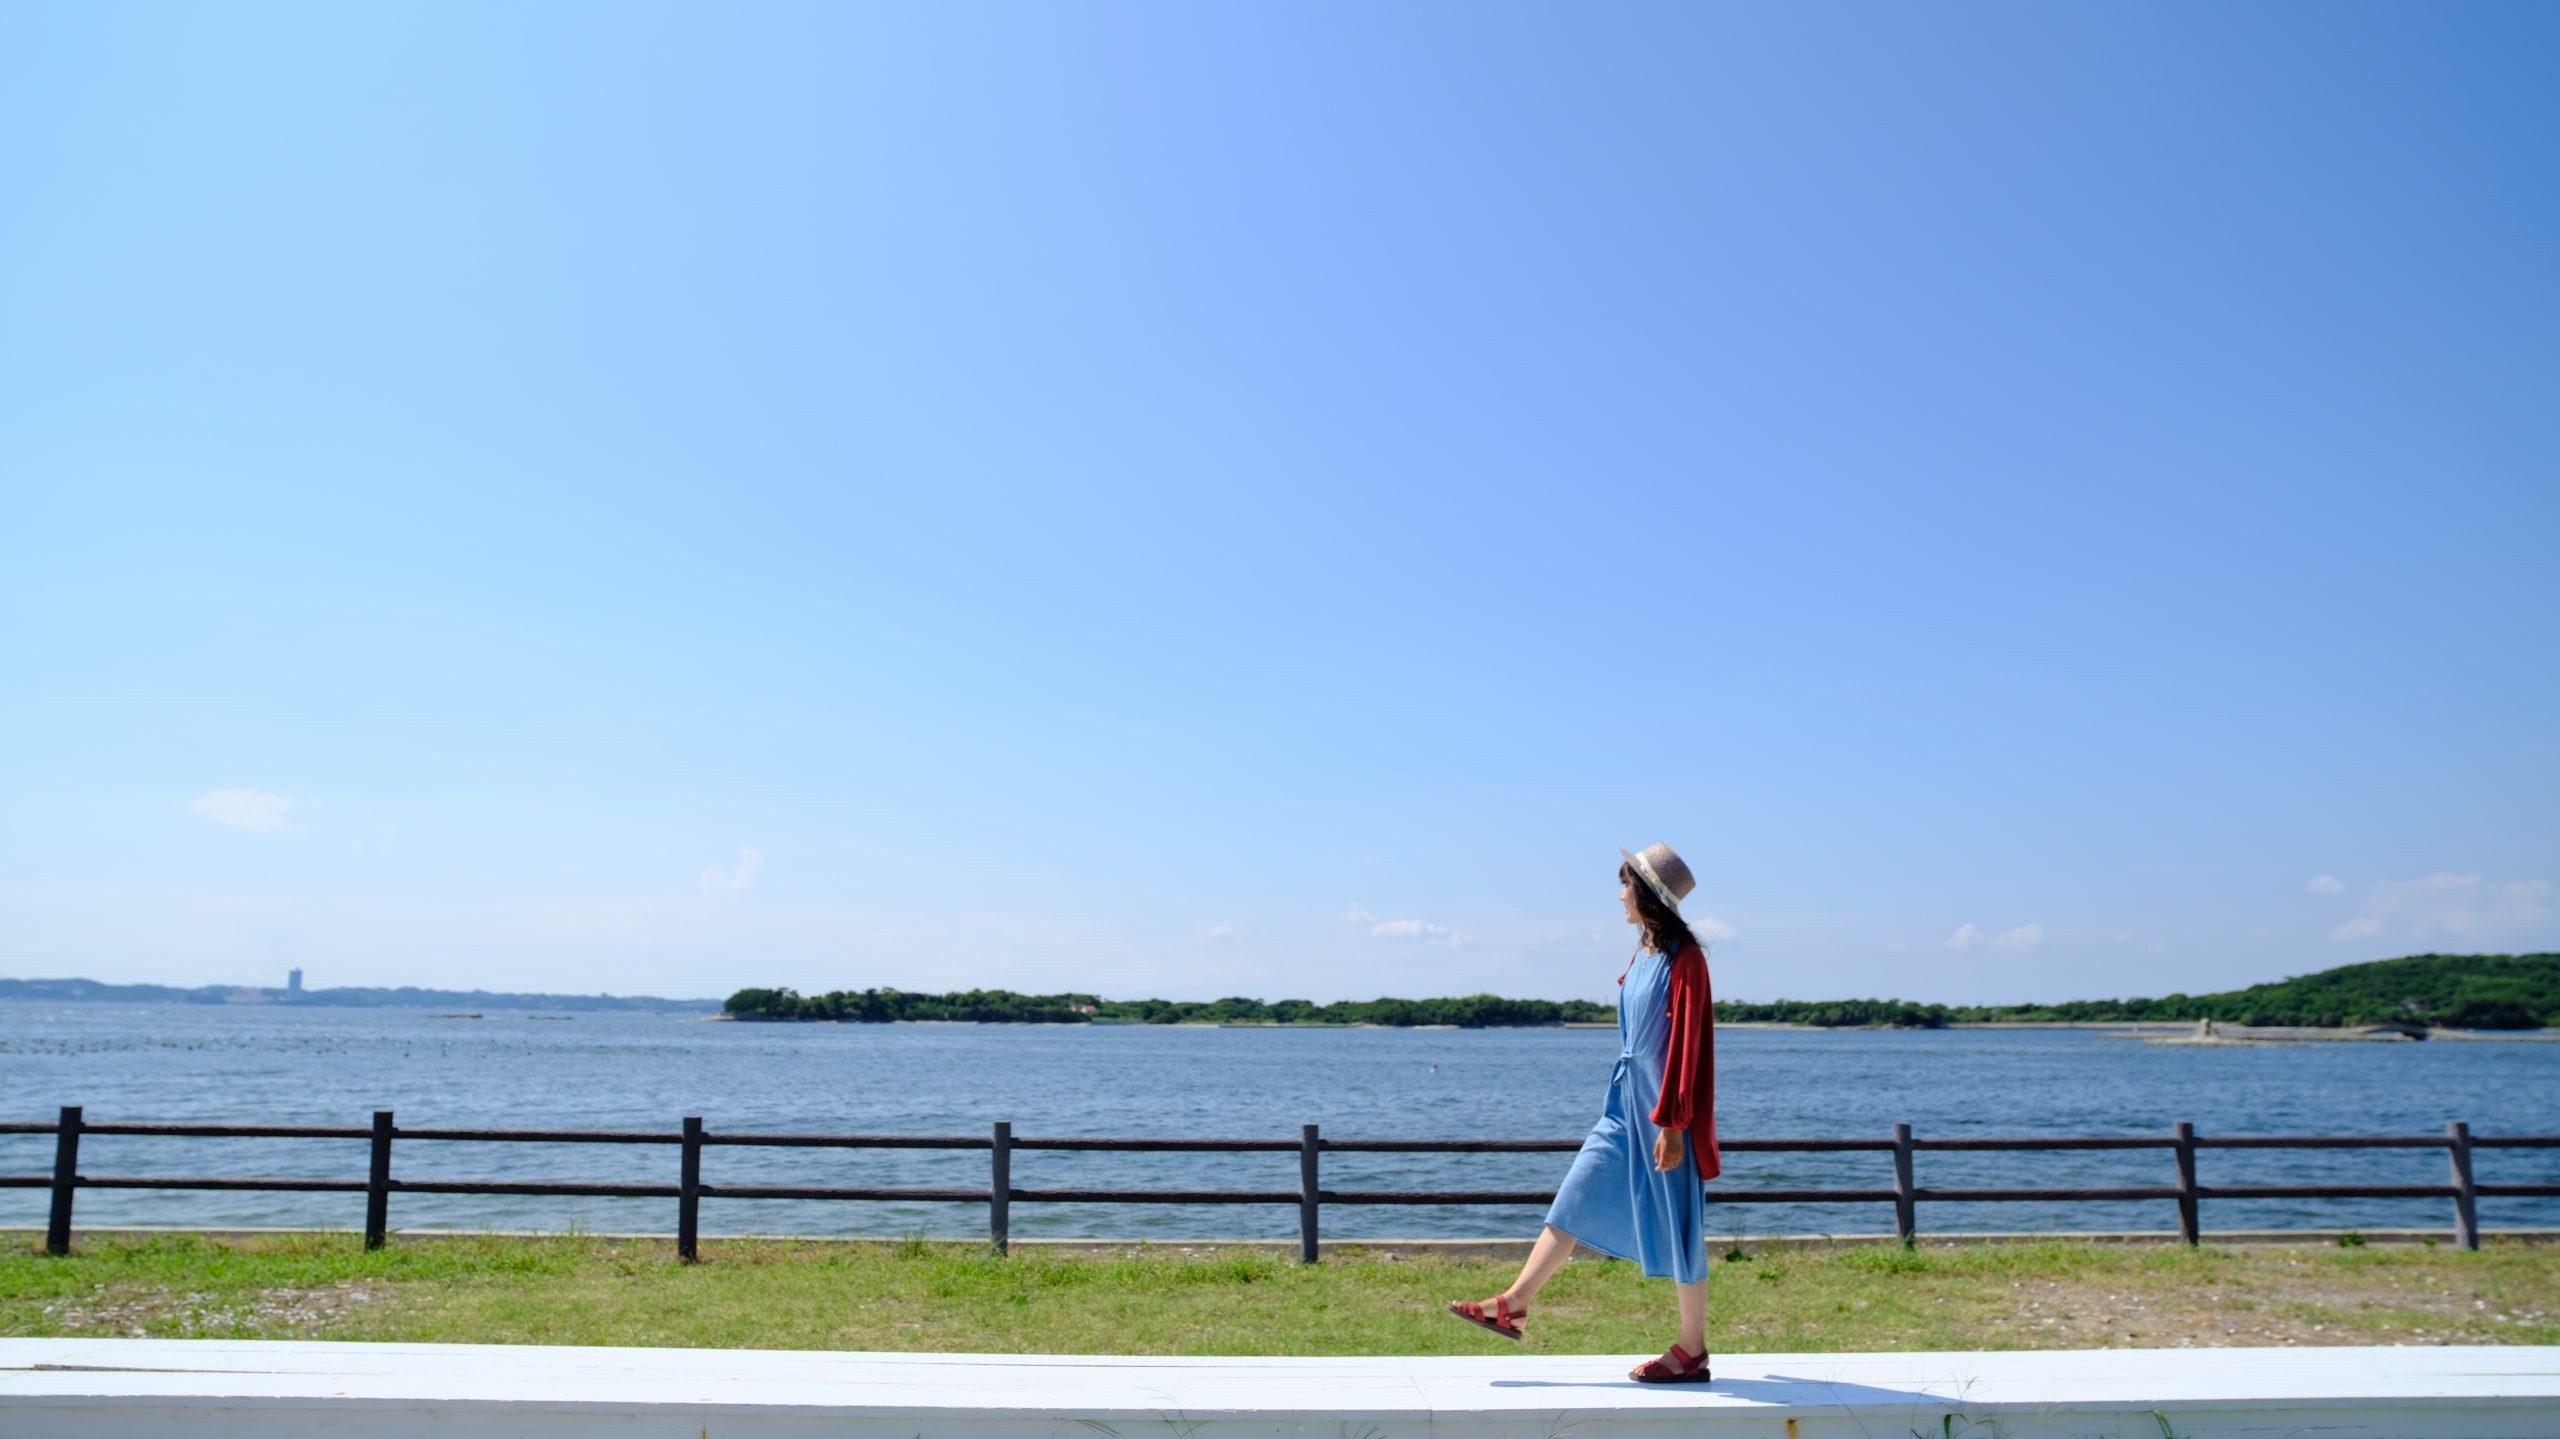 【FUJIFILM】GFX50Sと佐久島旅行